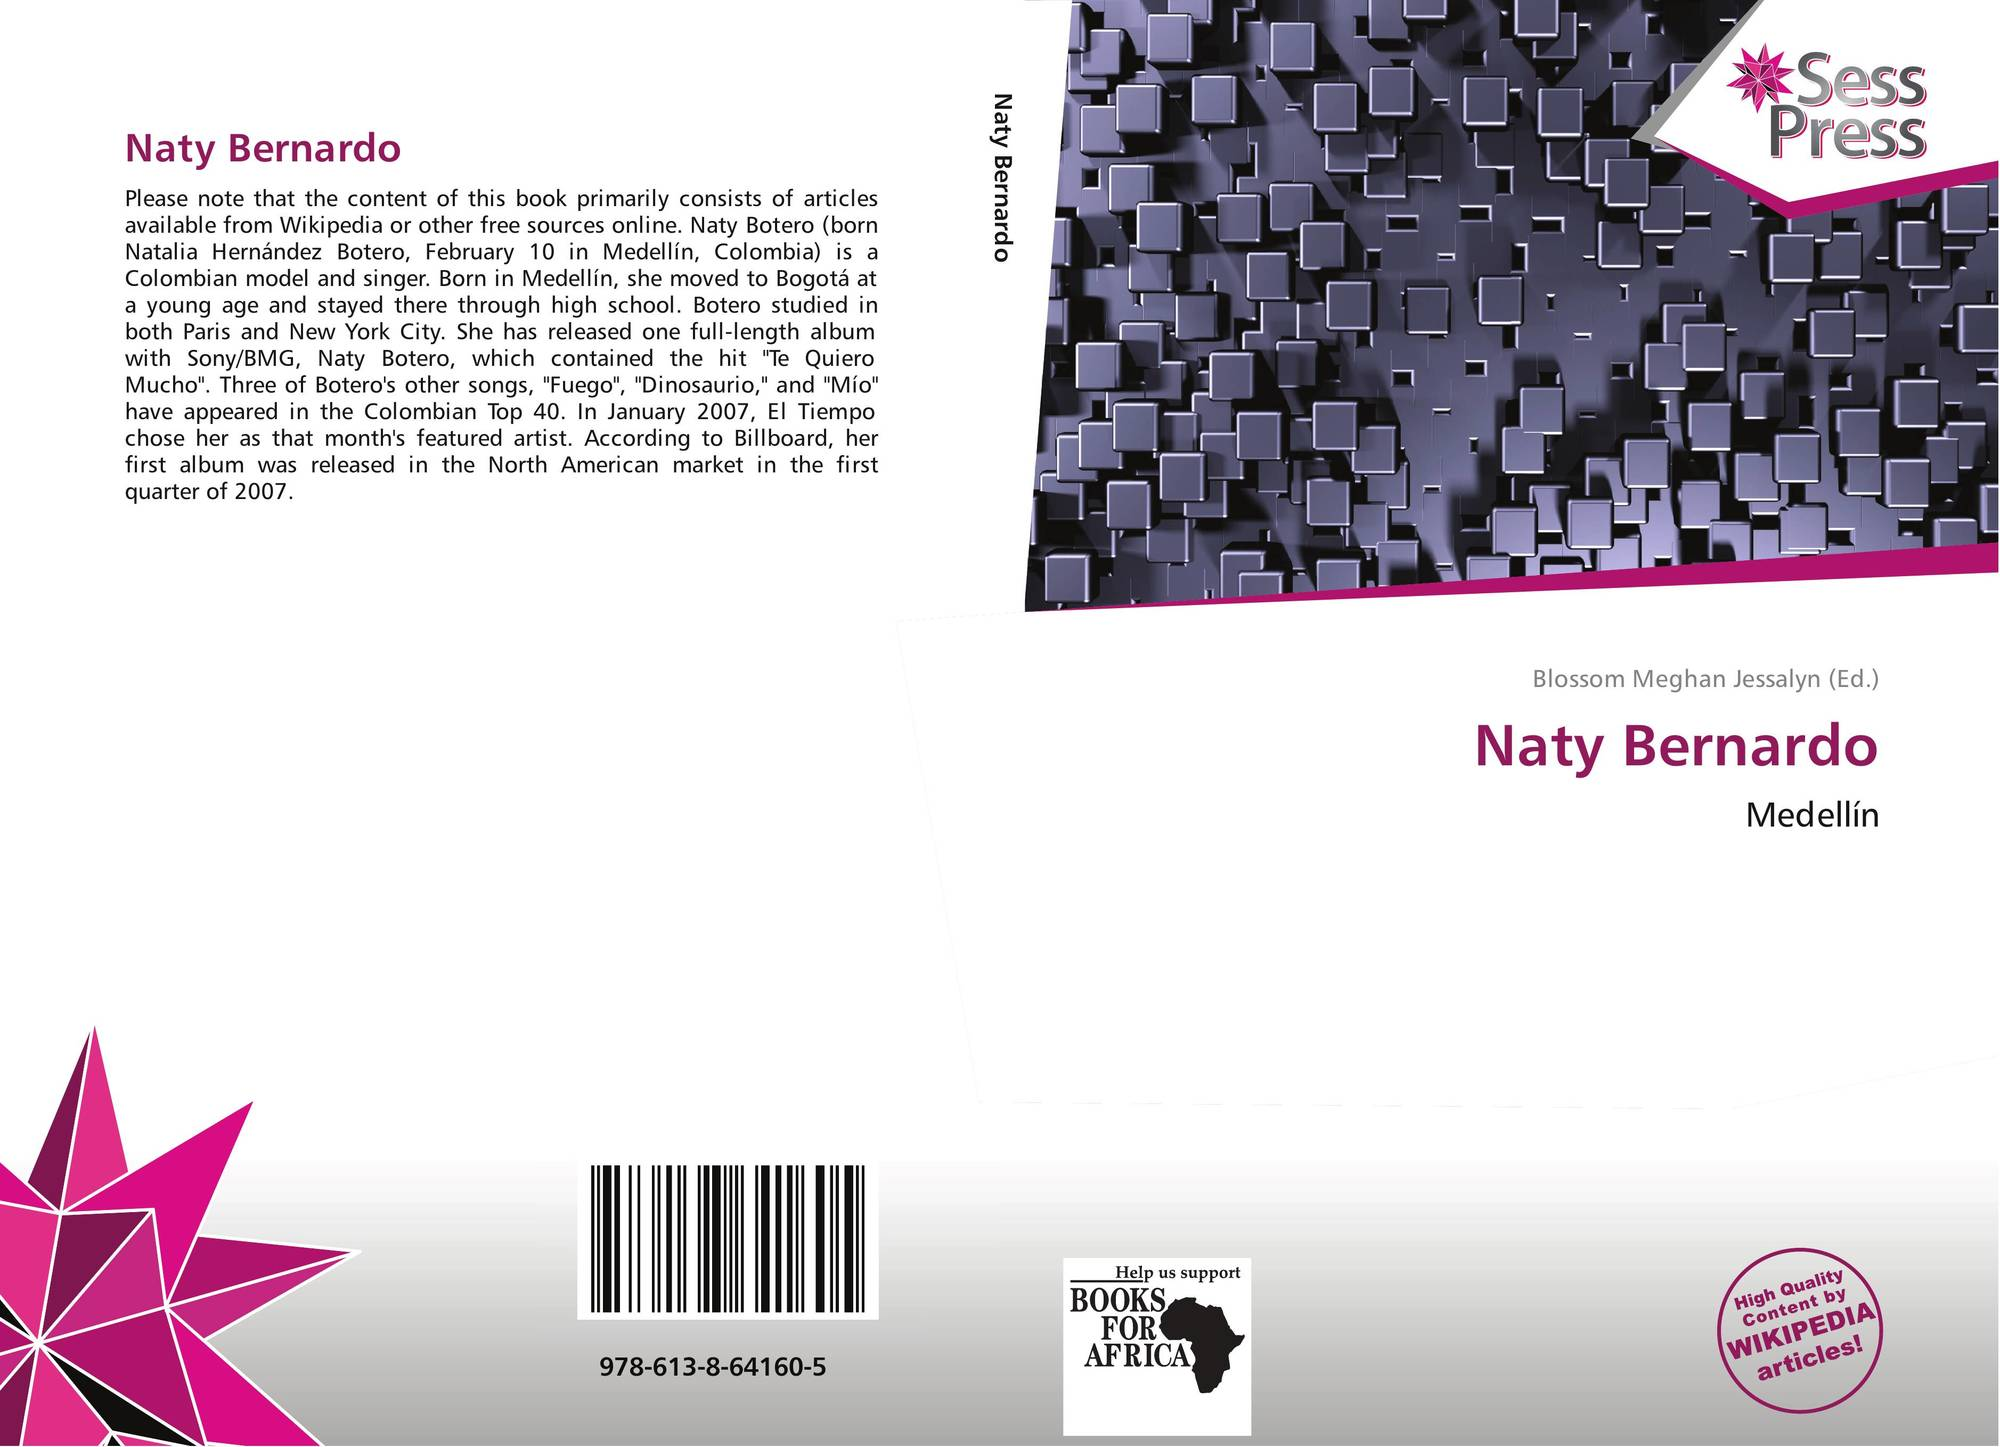 Naty Bernardo (?) nudes (94 photos), Sexy, Fappening, Selfie, butt 2018